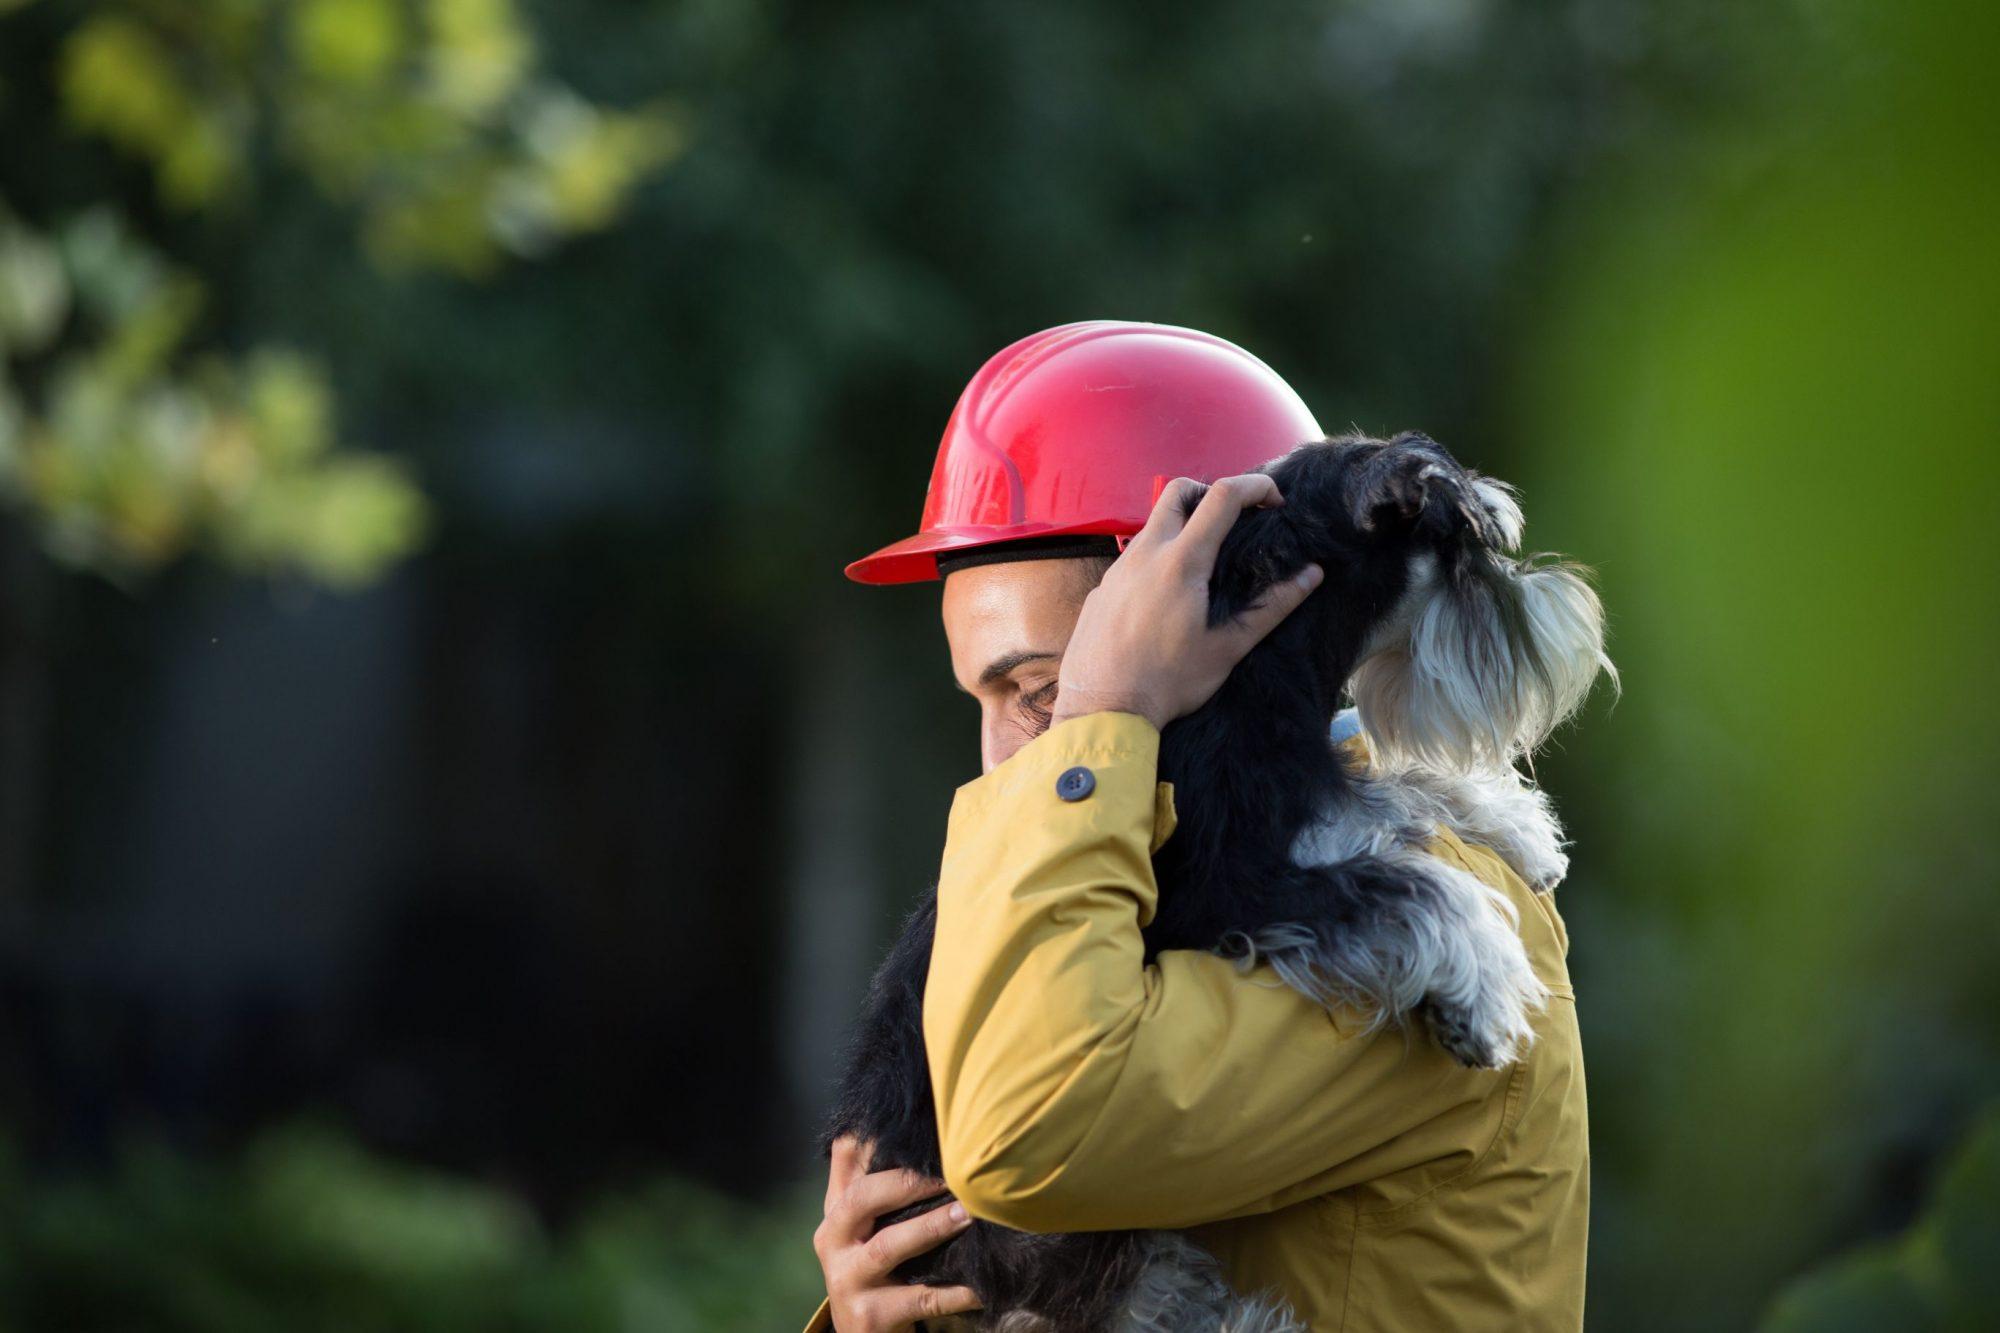 Pet emergency preparedness: A man saves a dog during an emergency.